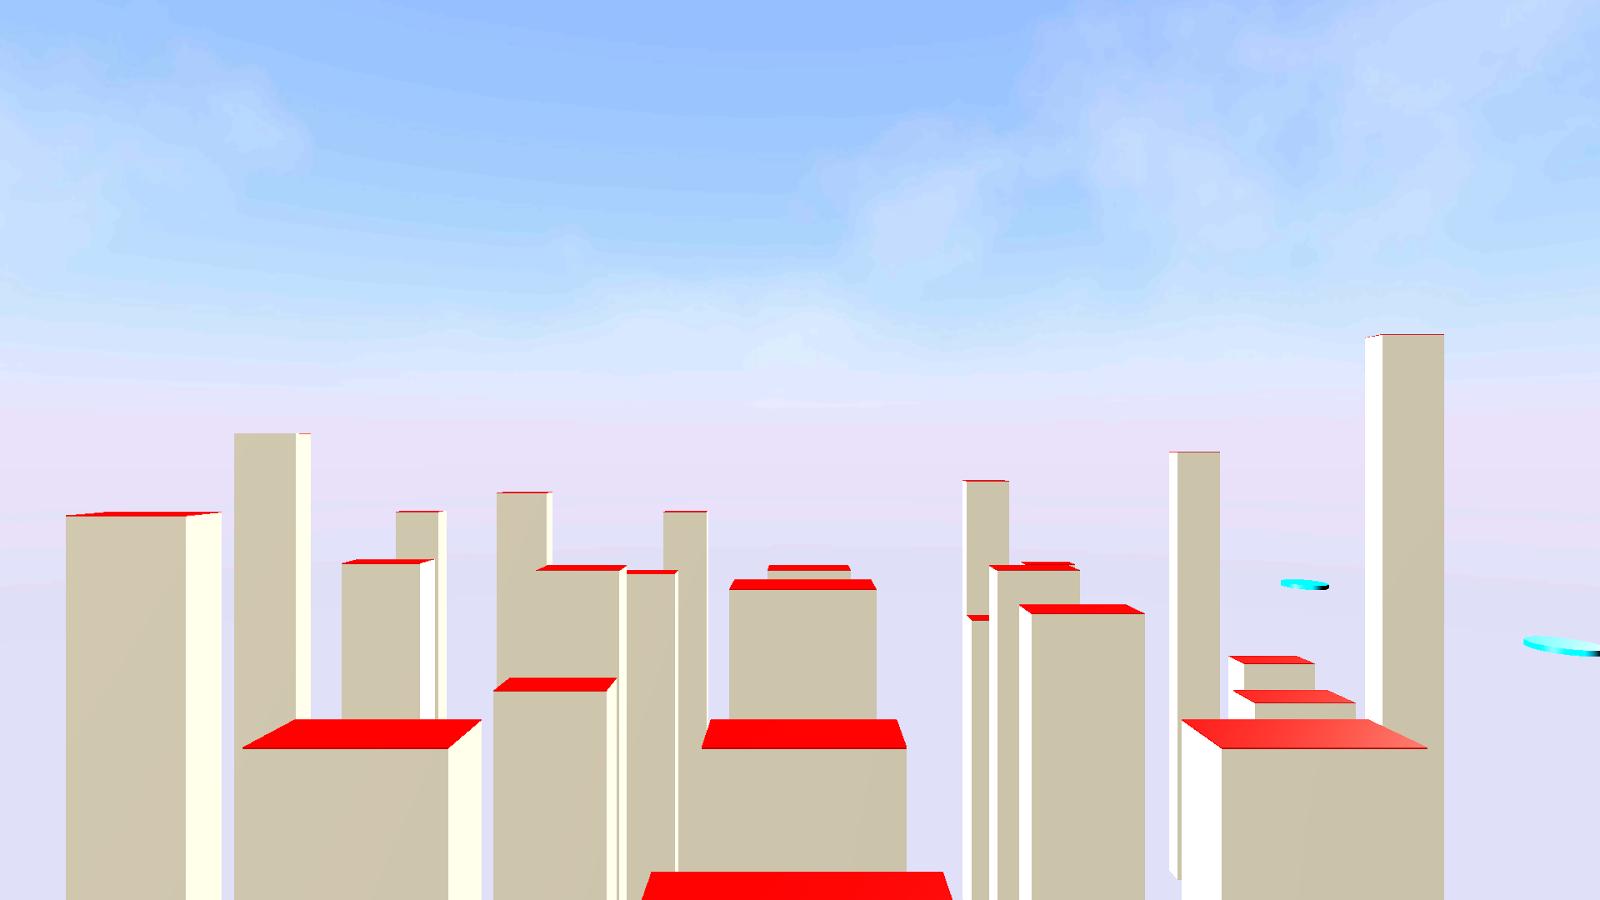 Jumper VR 1 0 APK Download - Android Arcade Games